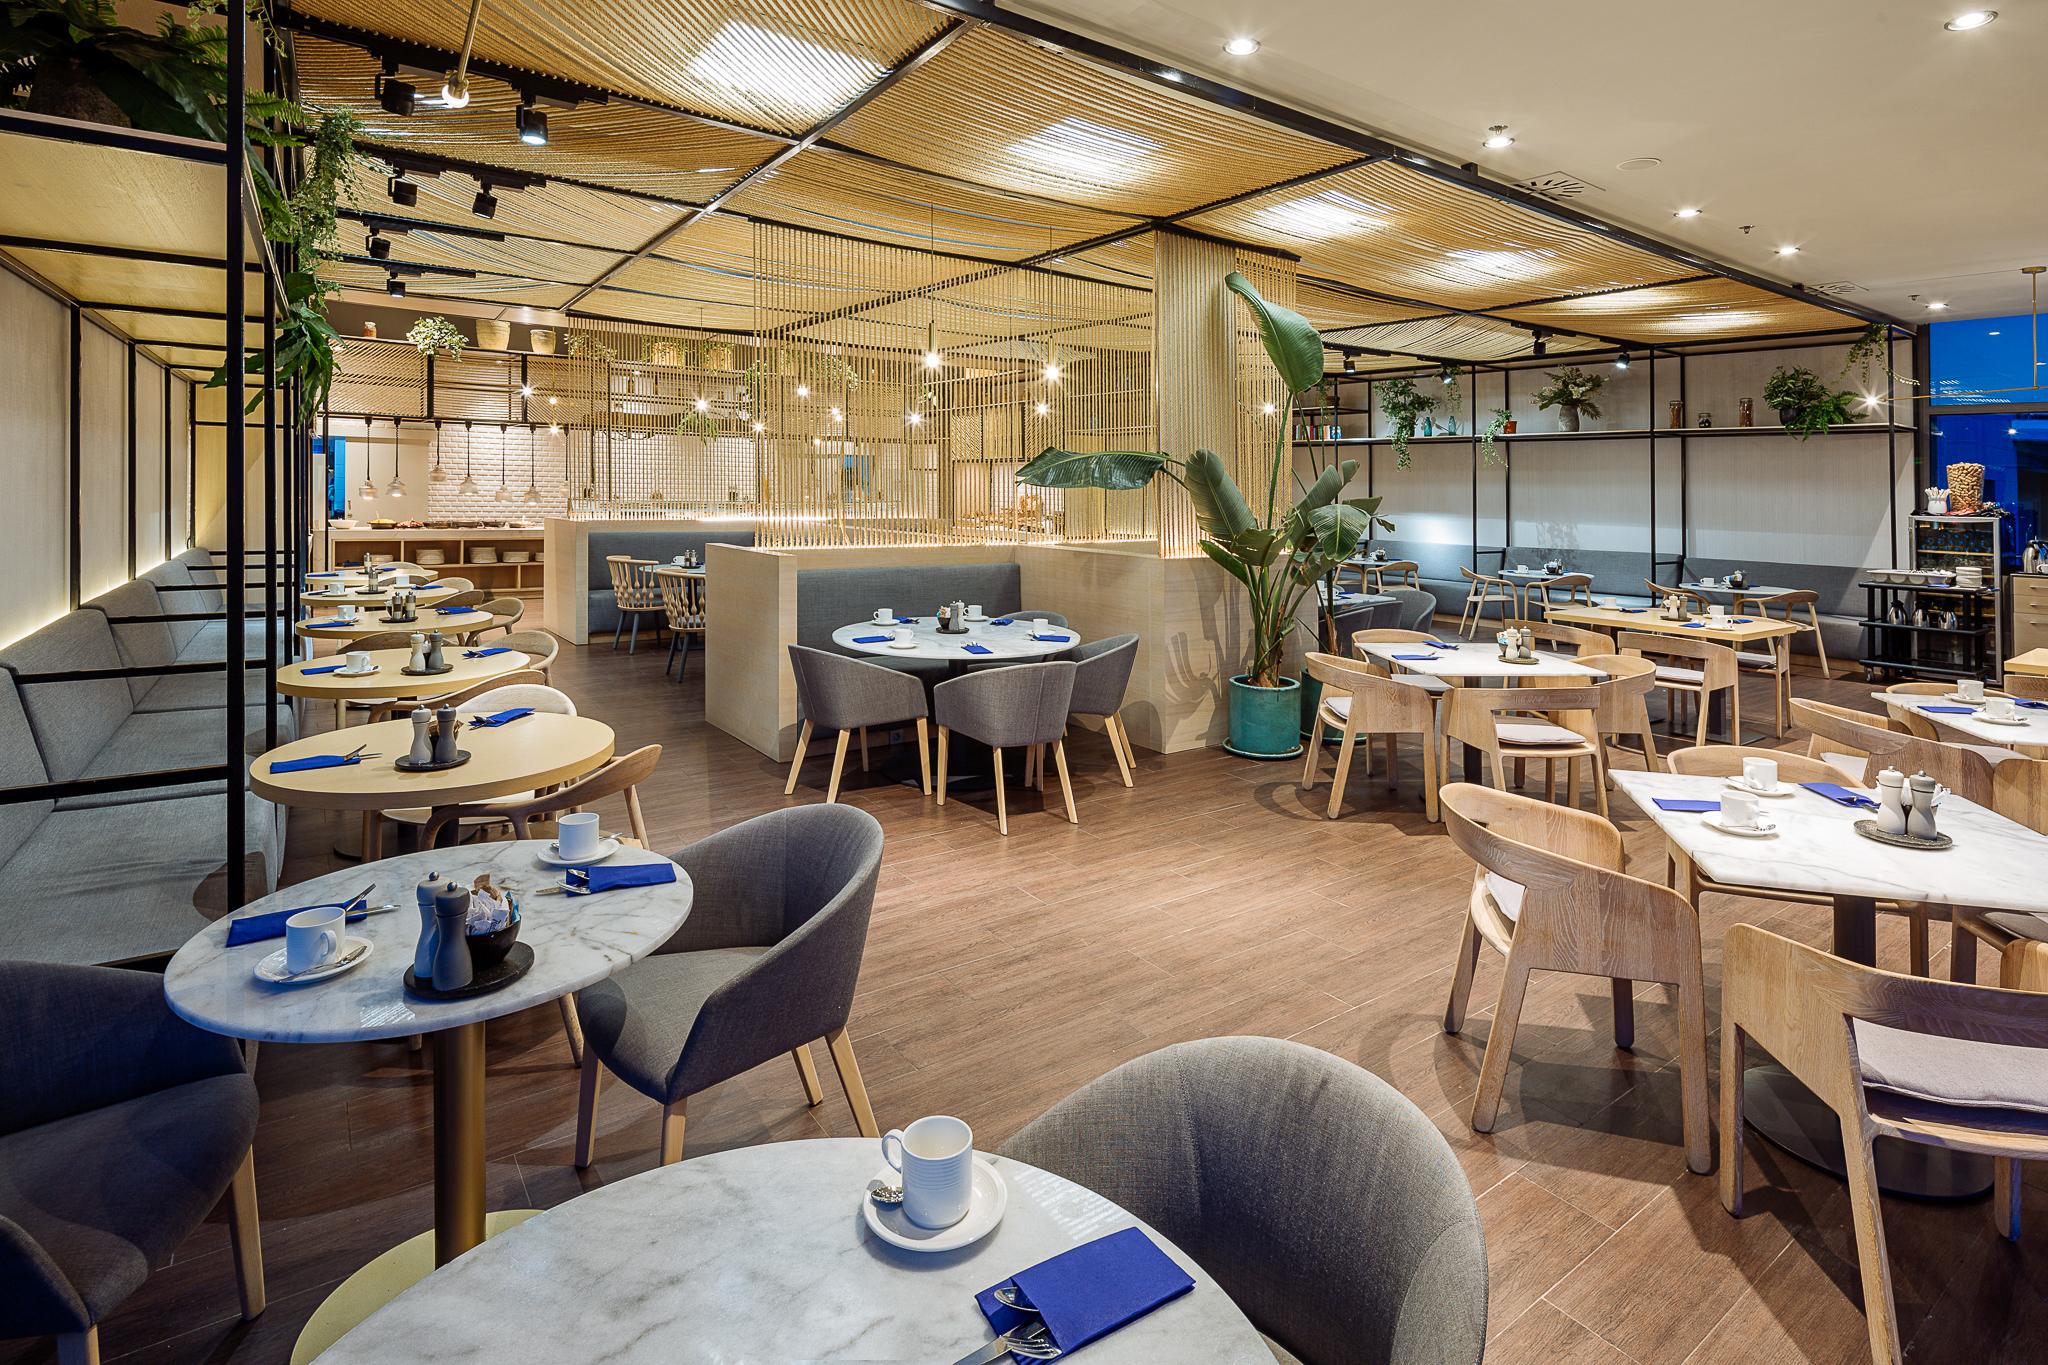 5* Hotel Restaurant